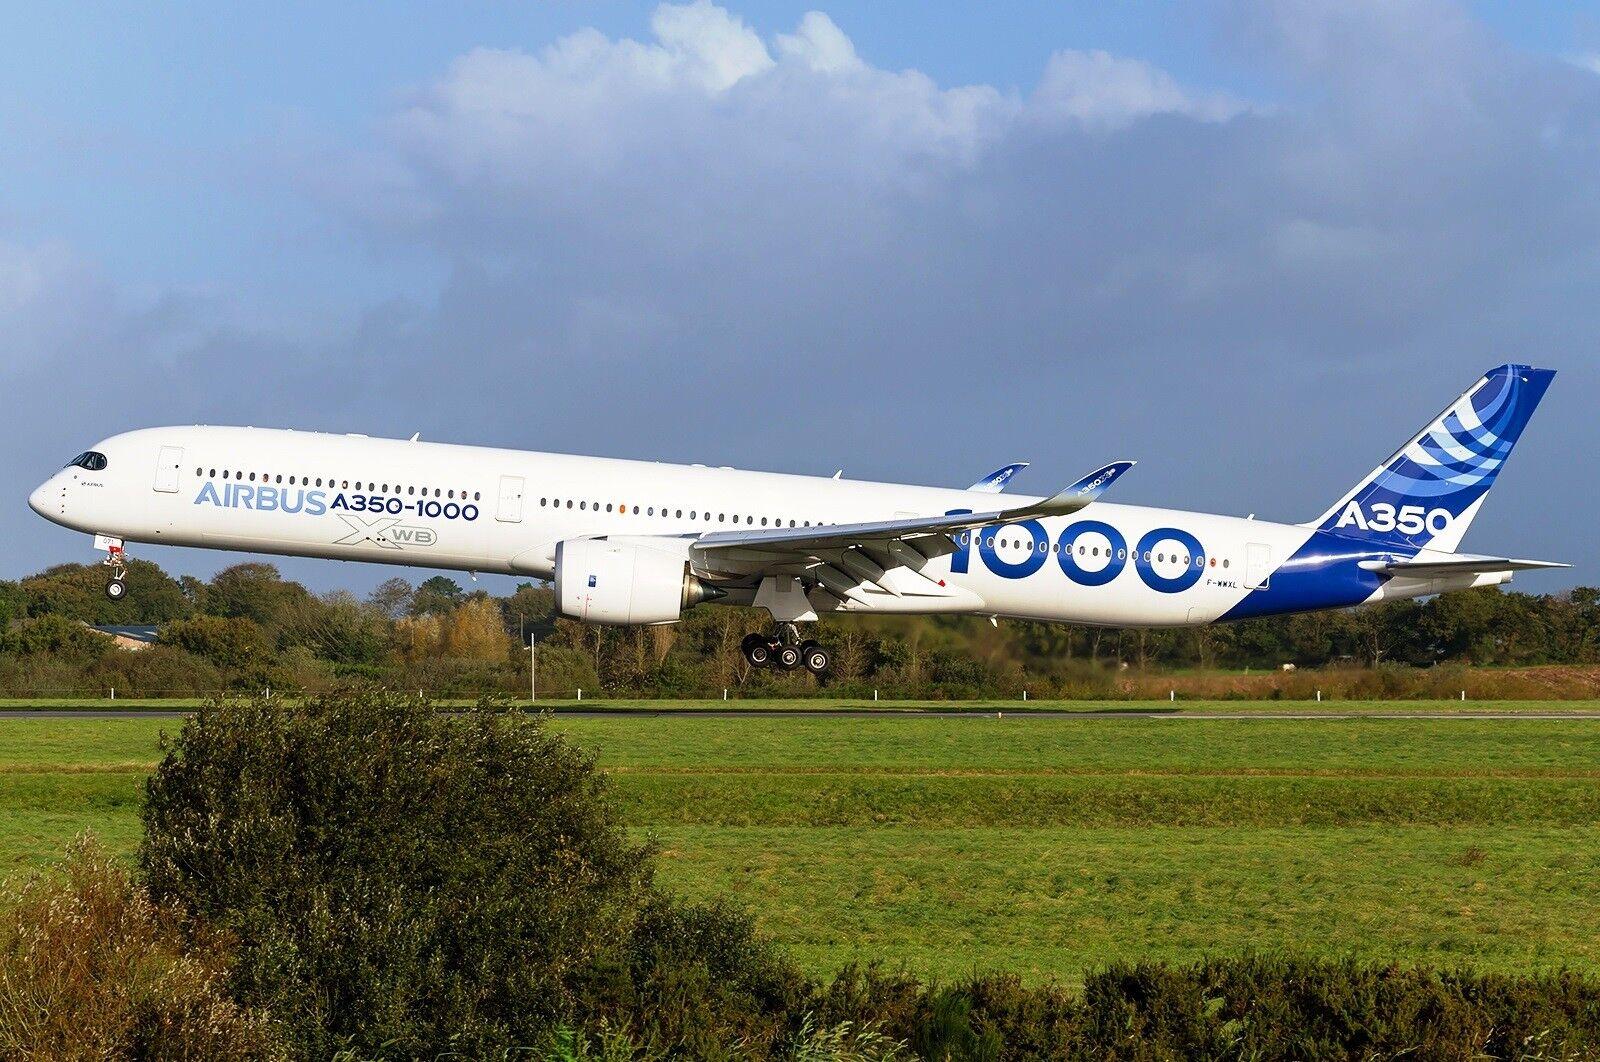 Jc Wings LH2086A 1200 Airautobus A3501000 FWwxl Casa Coloreee Flaps Down con Ste